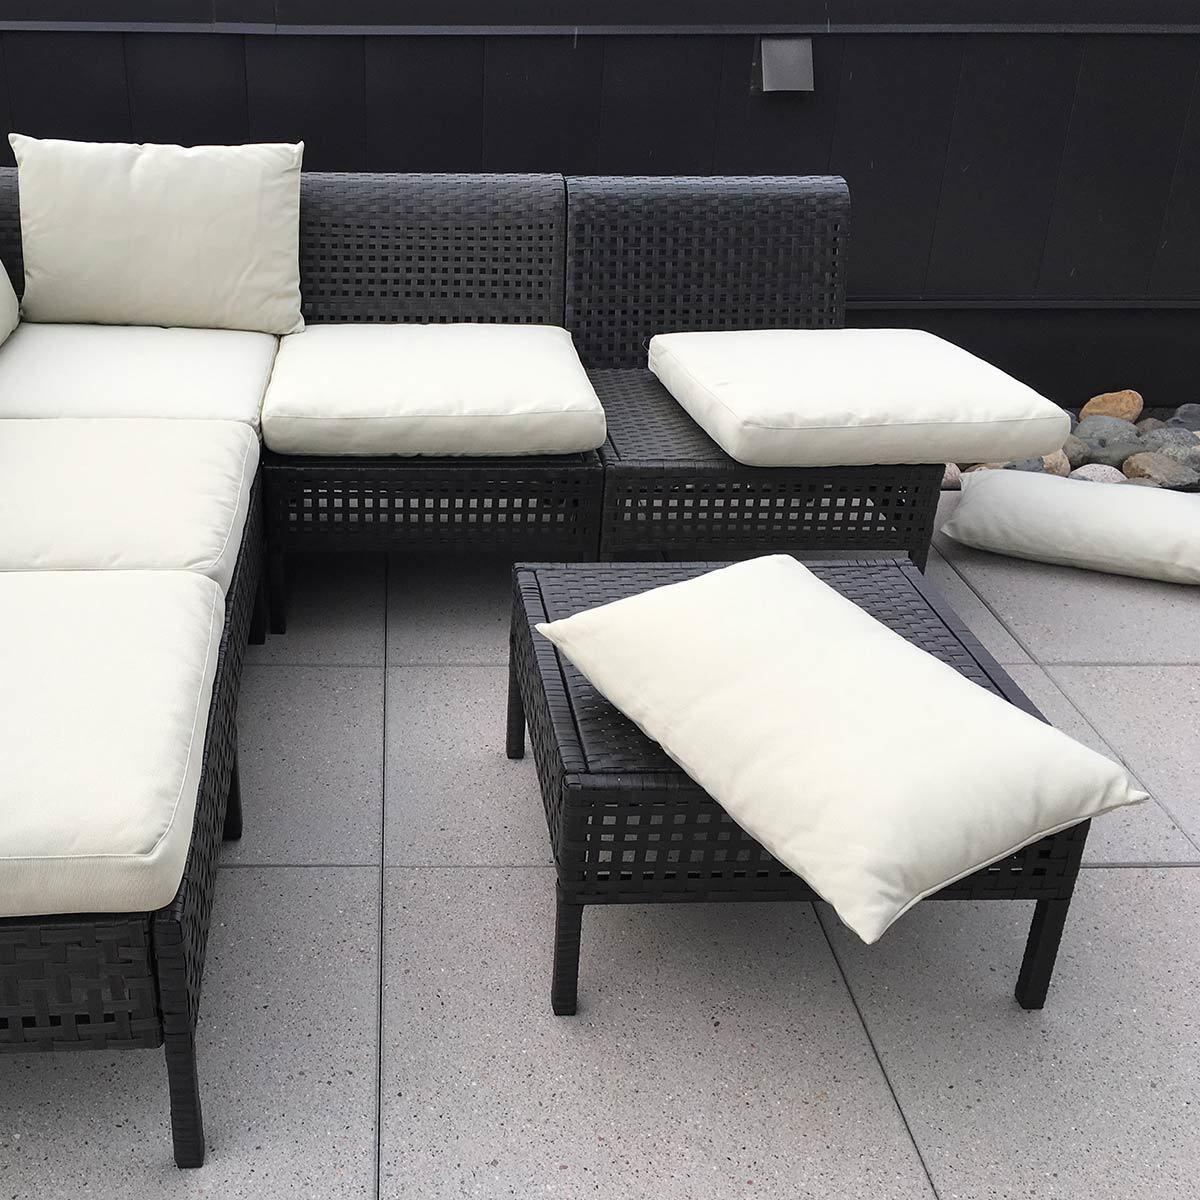 ikea chair cushions aeron desk hacks add ties to outdoor furniture the